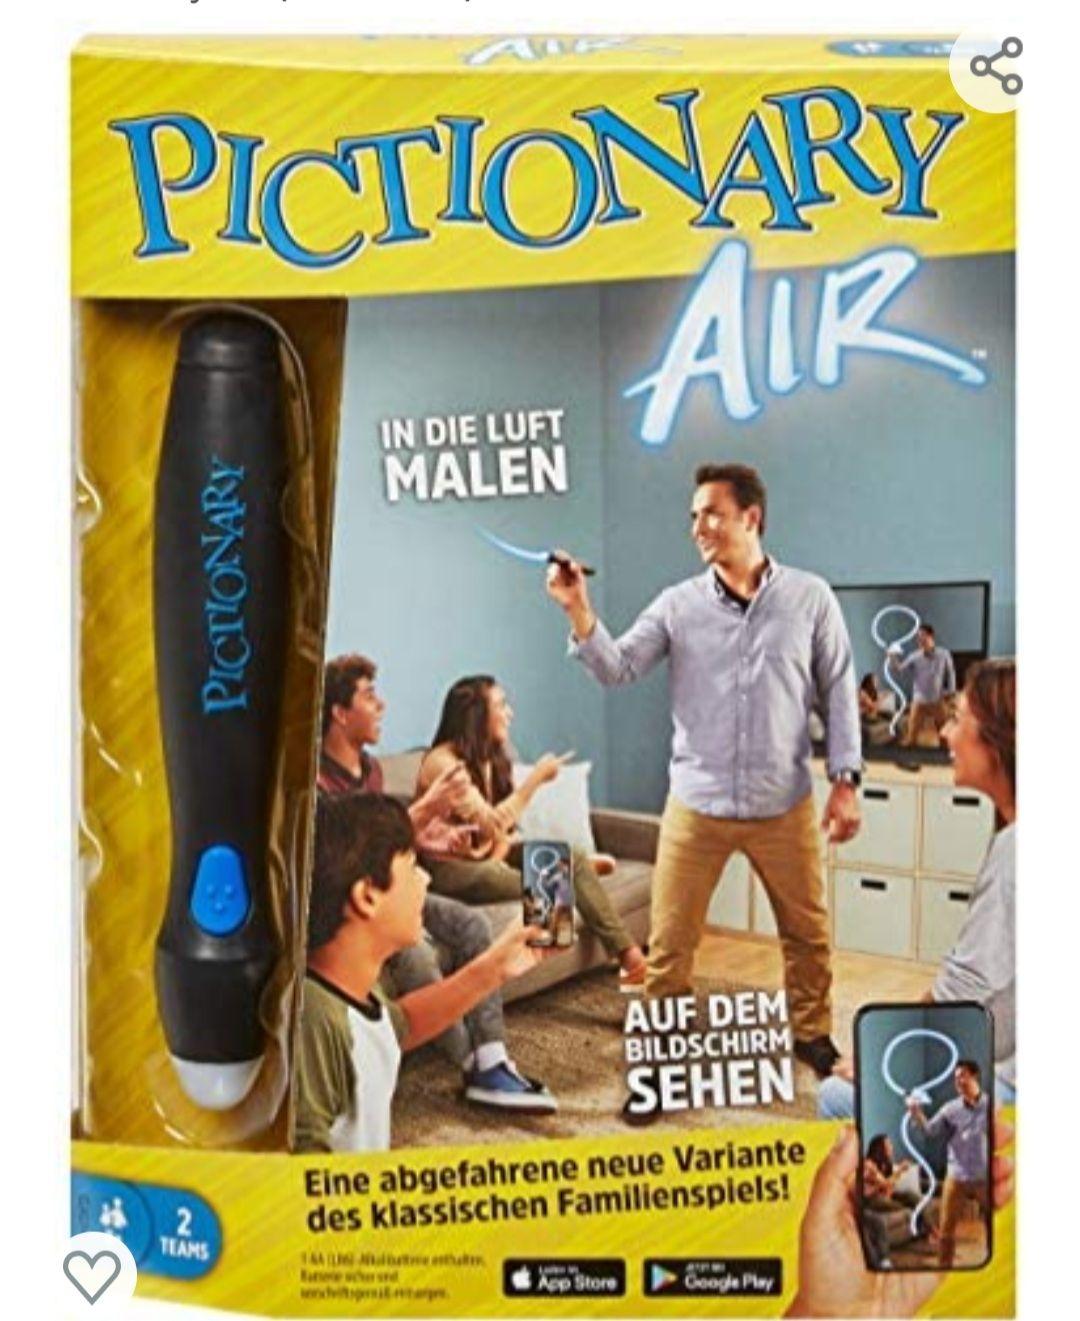 Pictionary Air Reaco